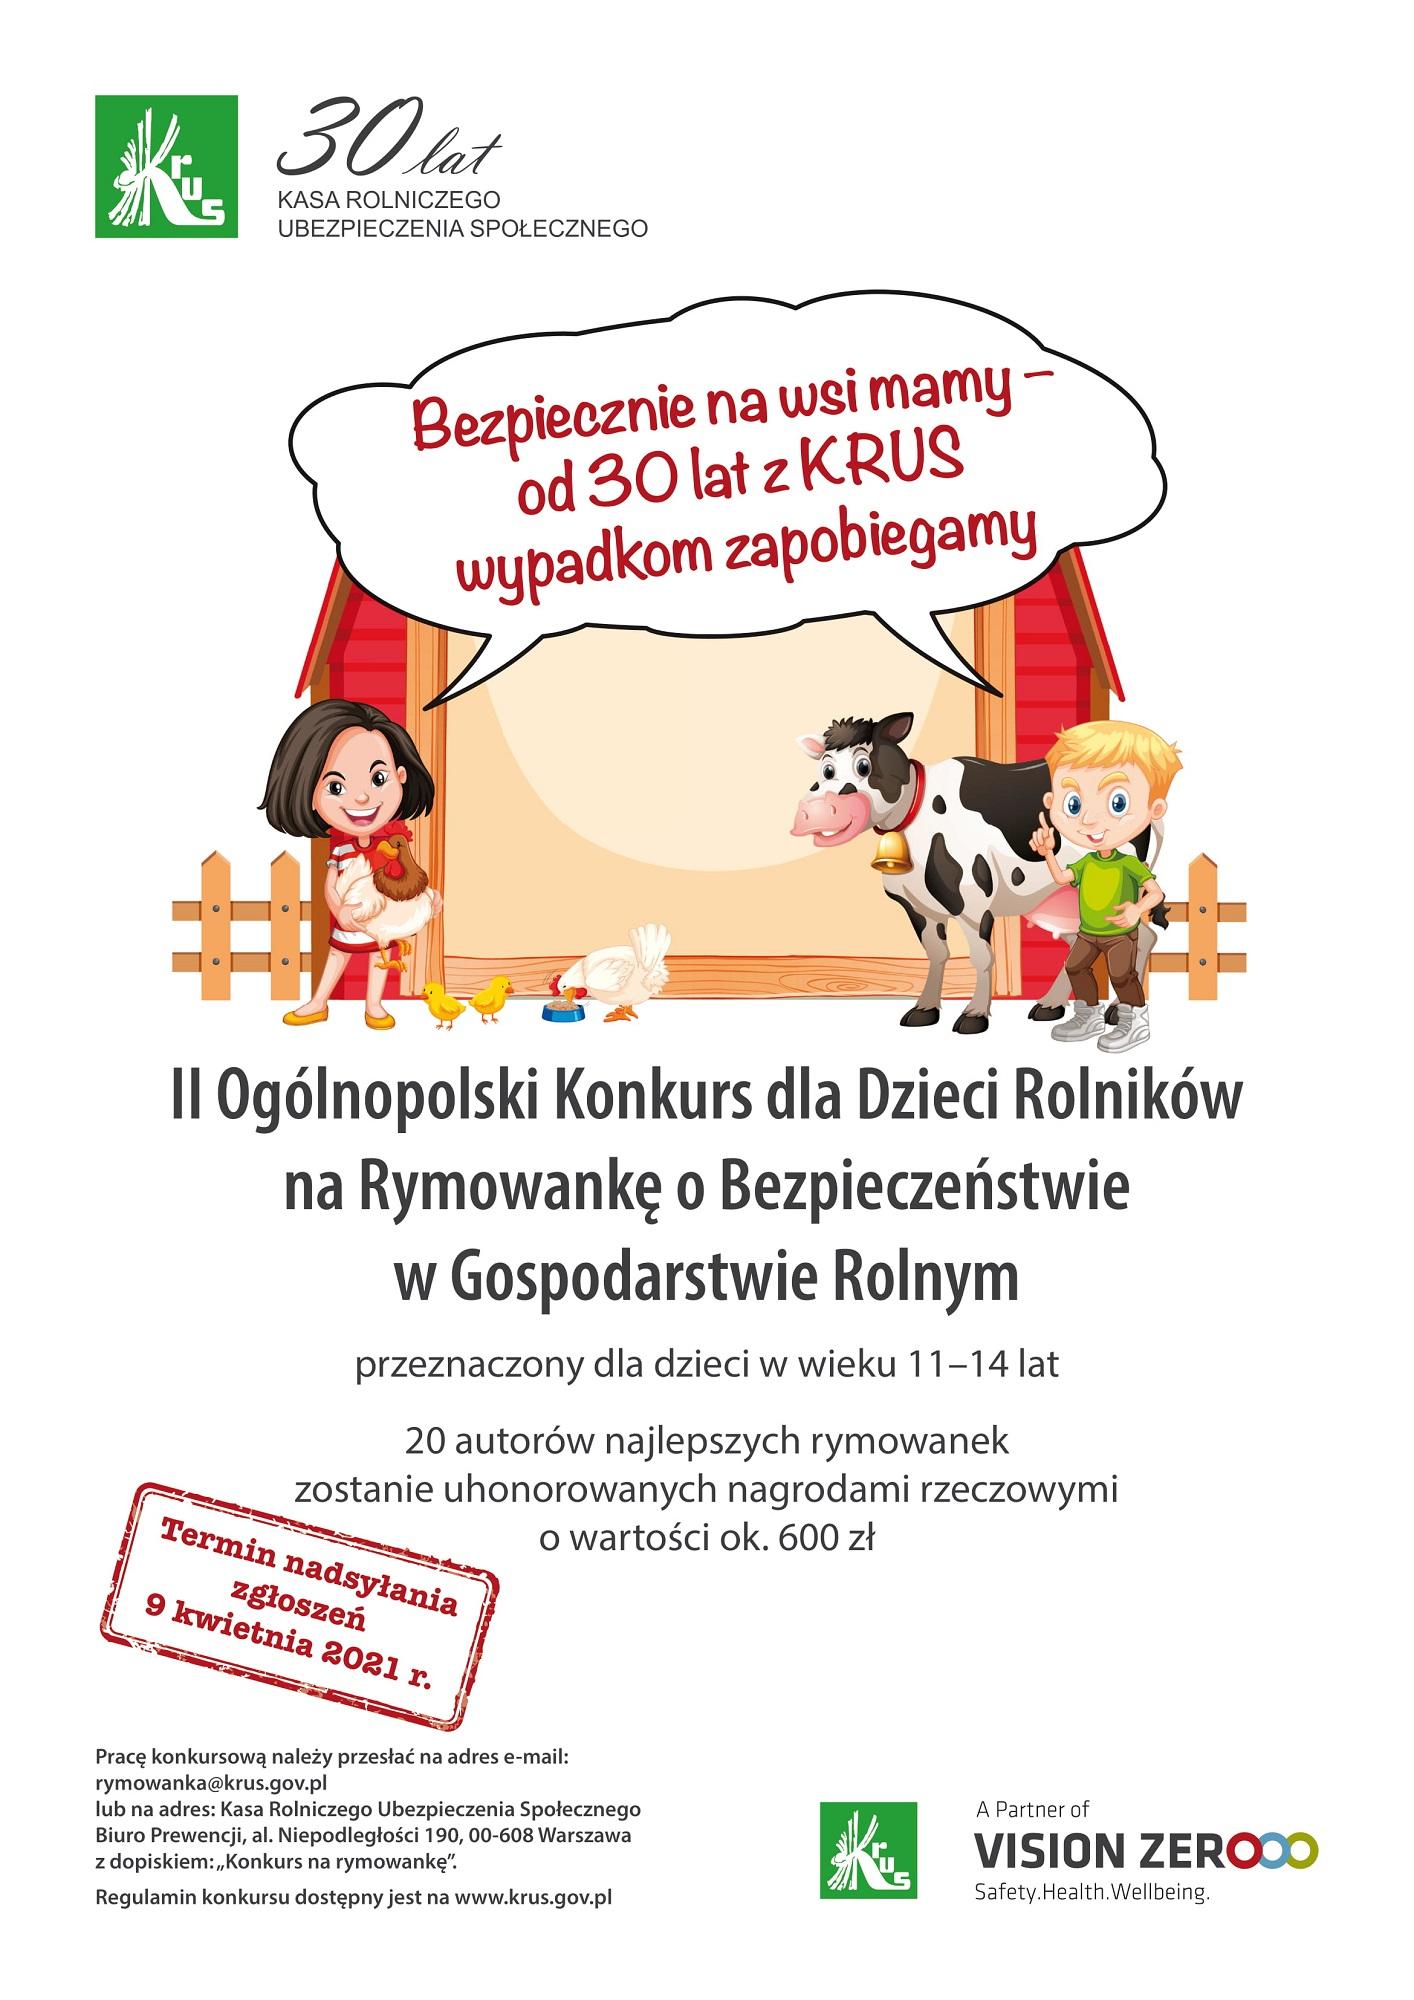 Plakat promujący konkursu KRUS